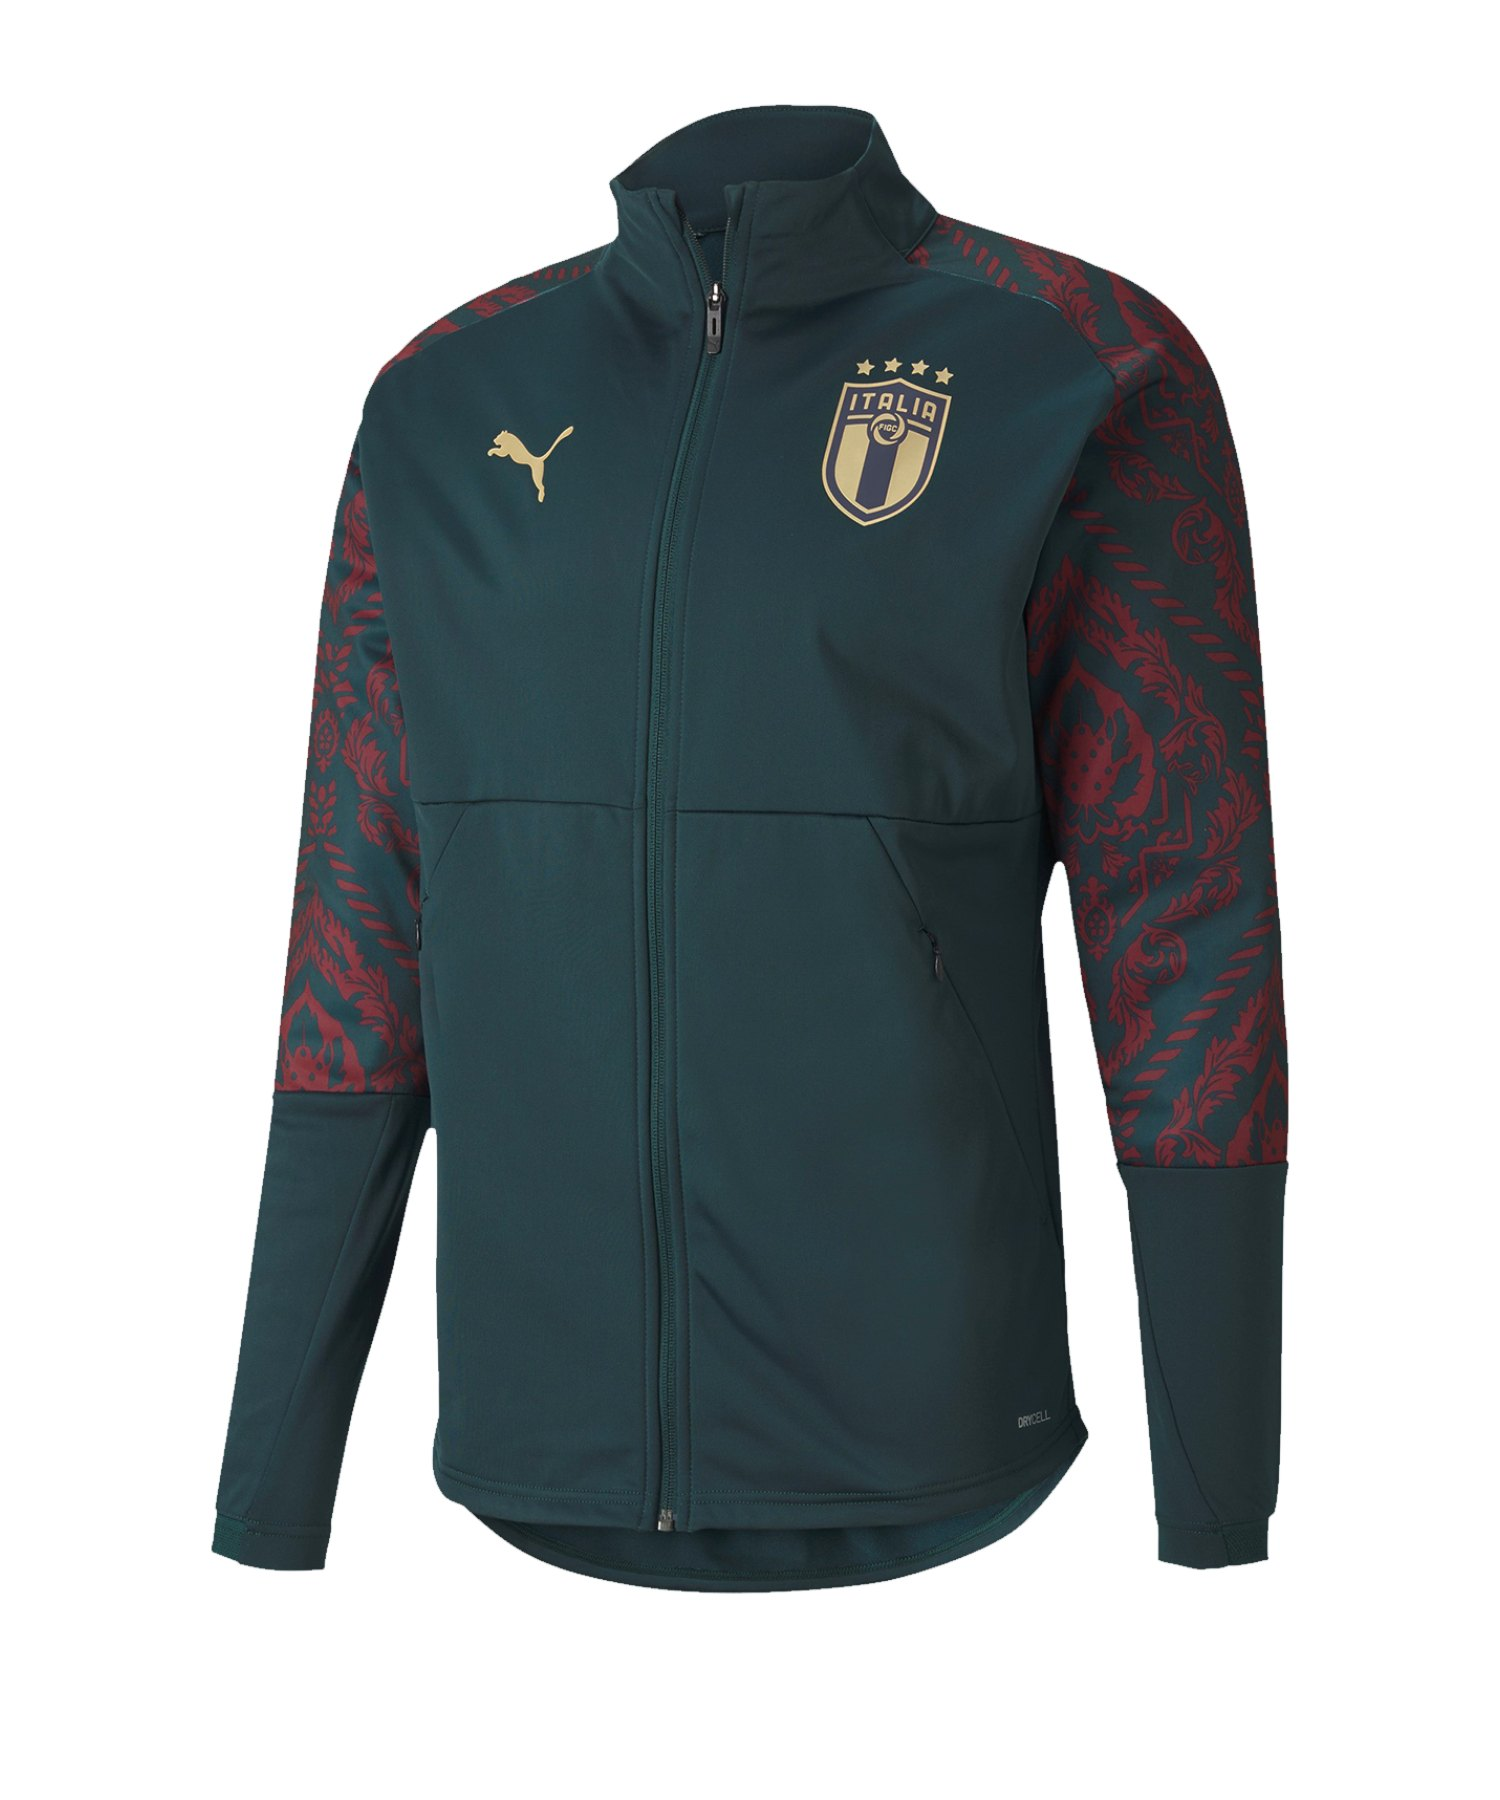 PUMA Italien Stadium Third Jacket Jacke Grün F10 - gruen